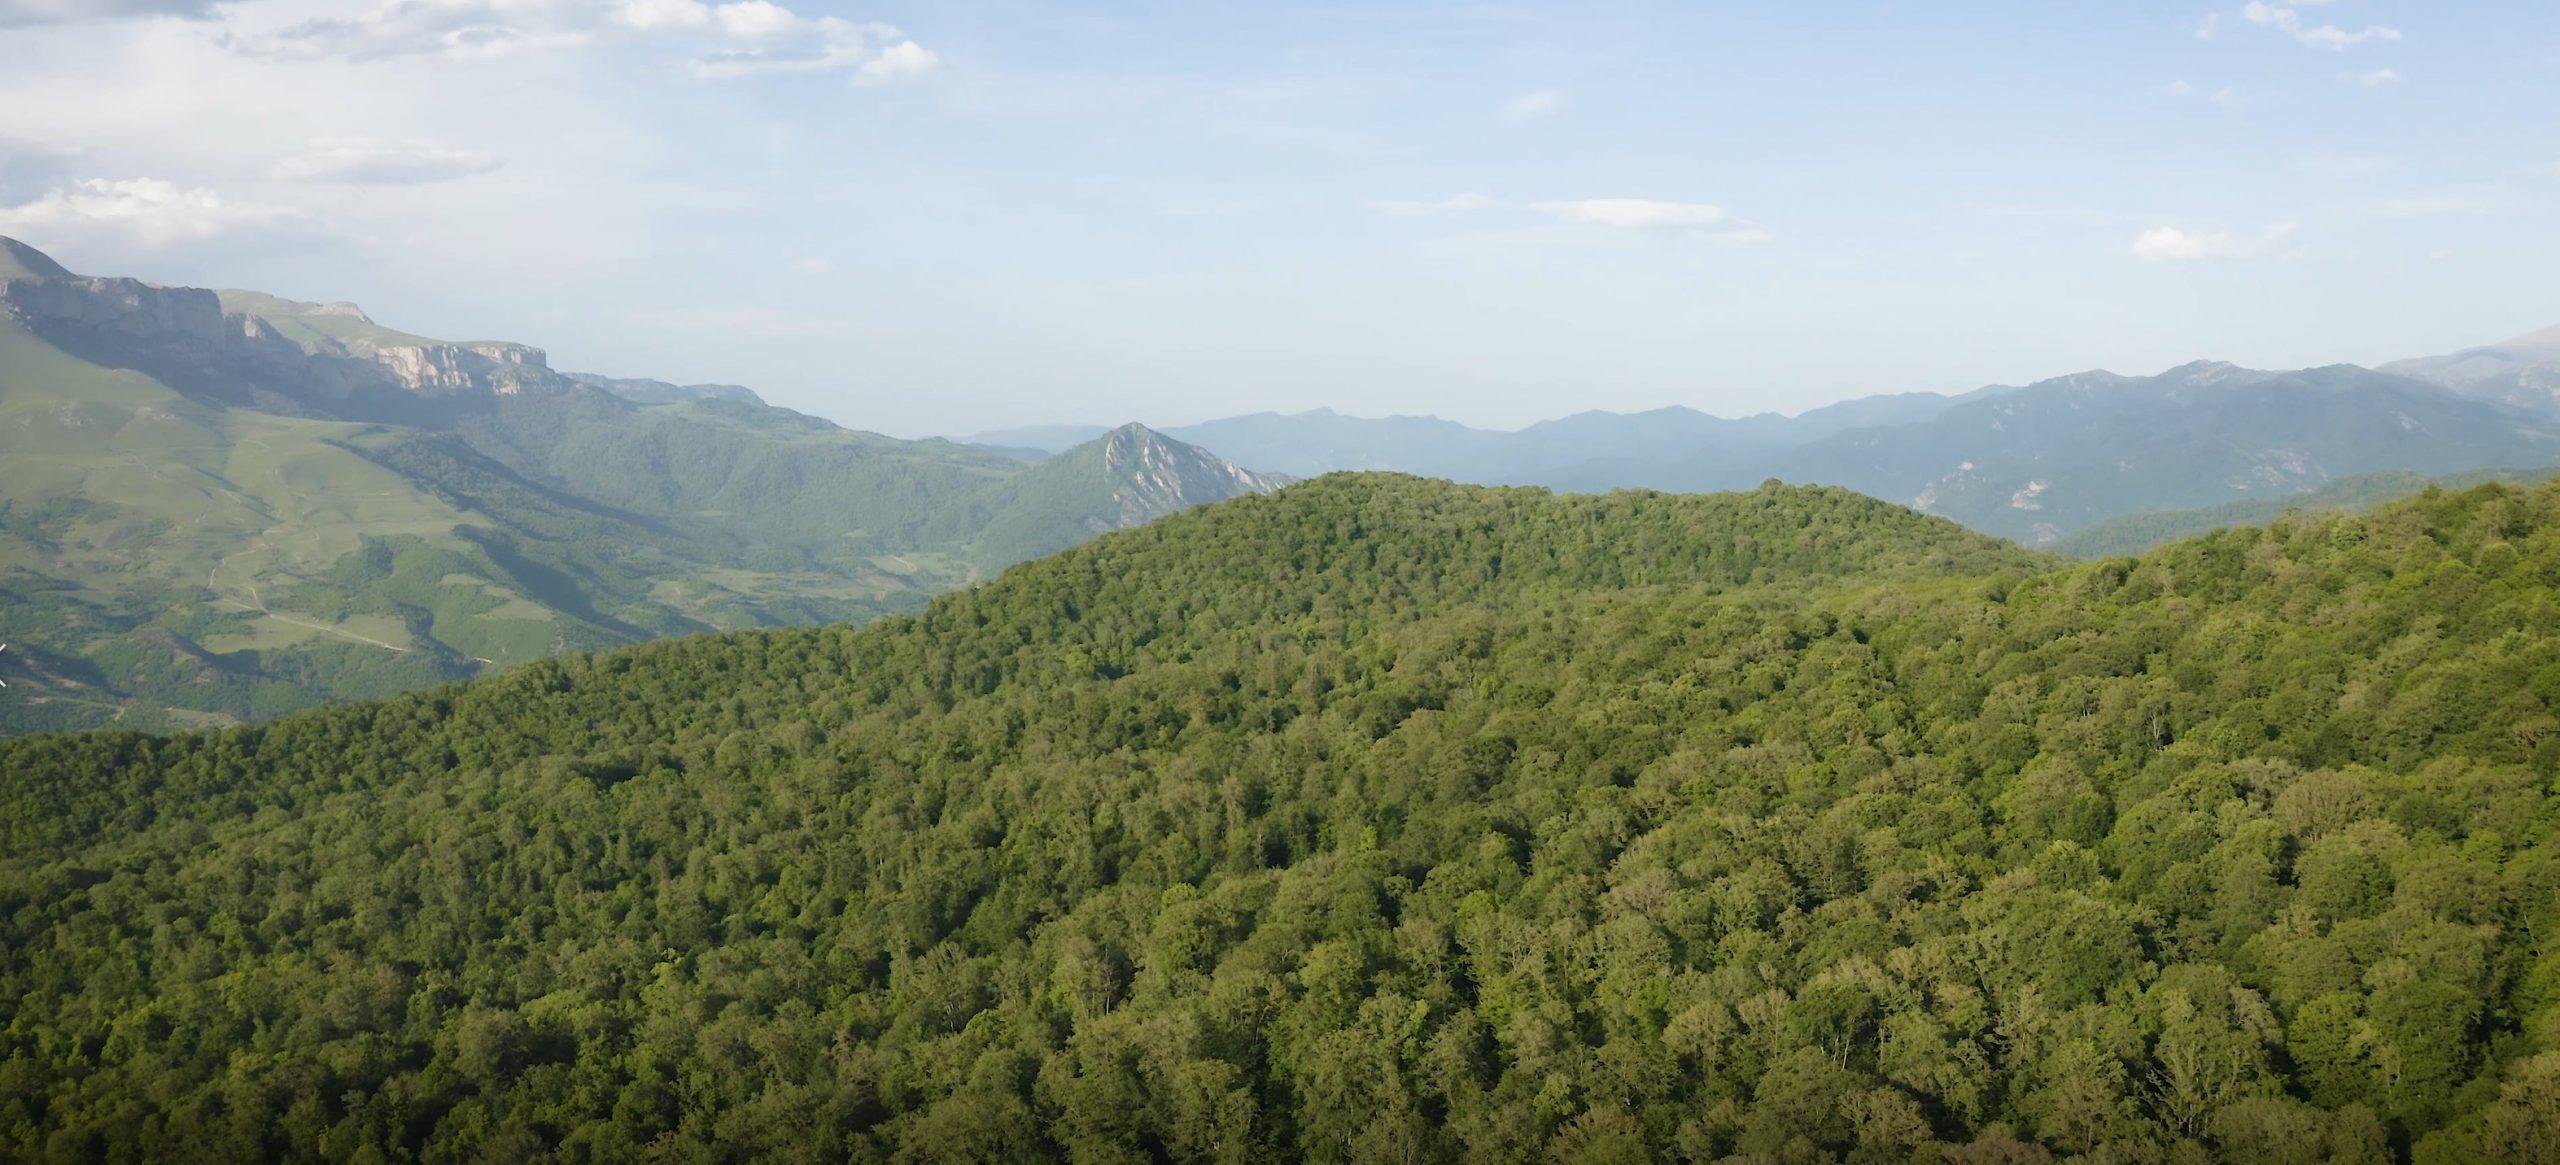 Dilijan National Park, Armenia